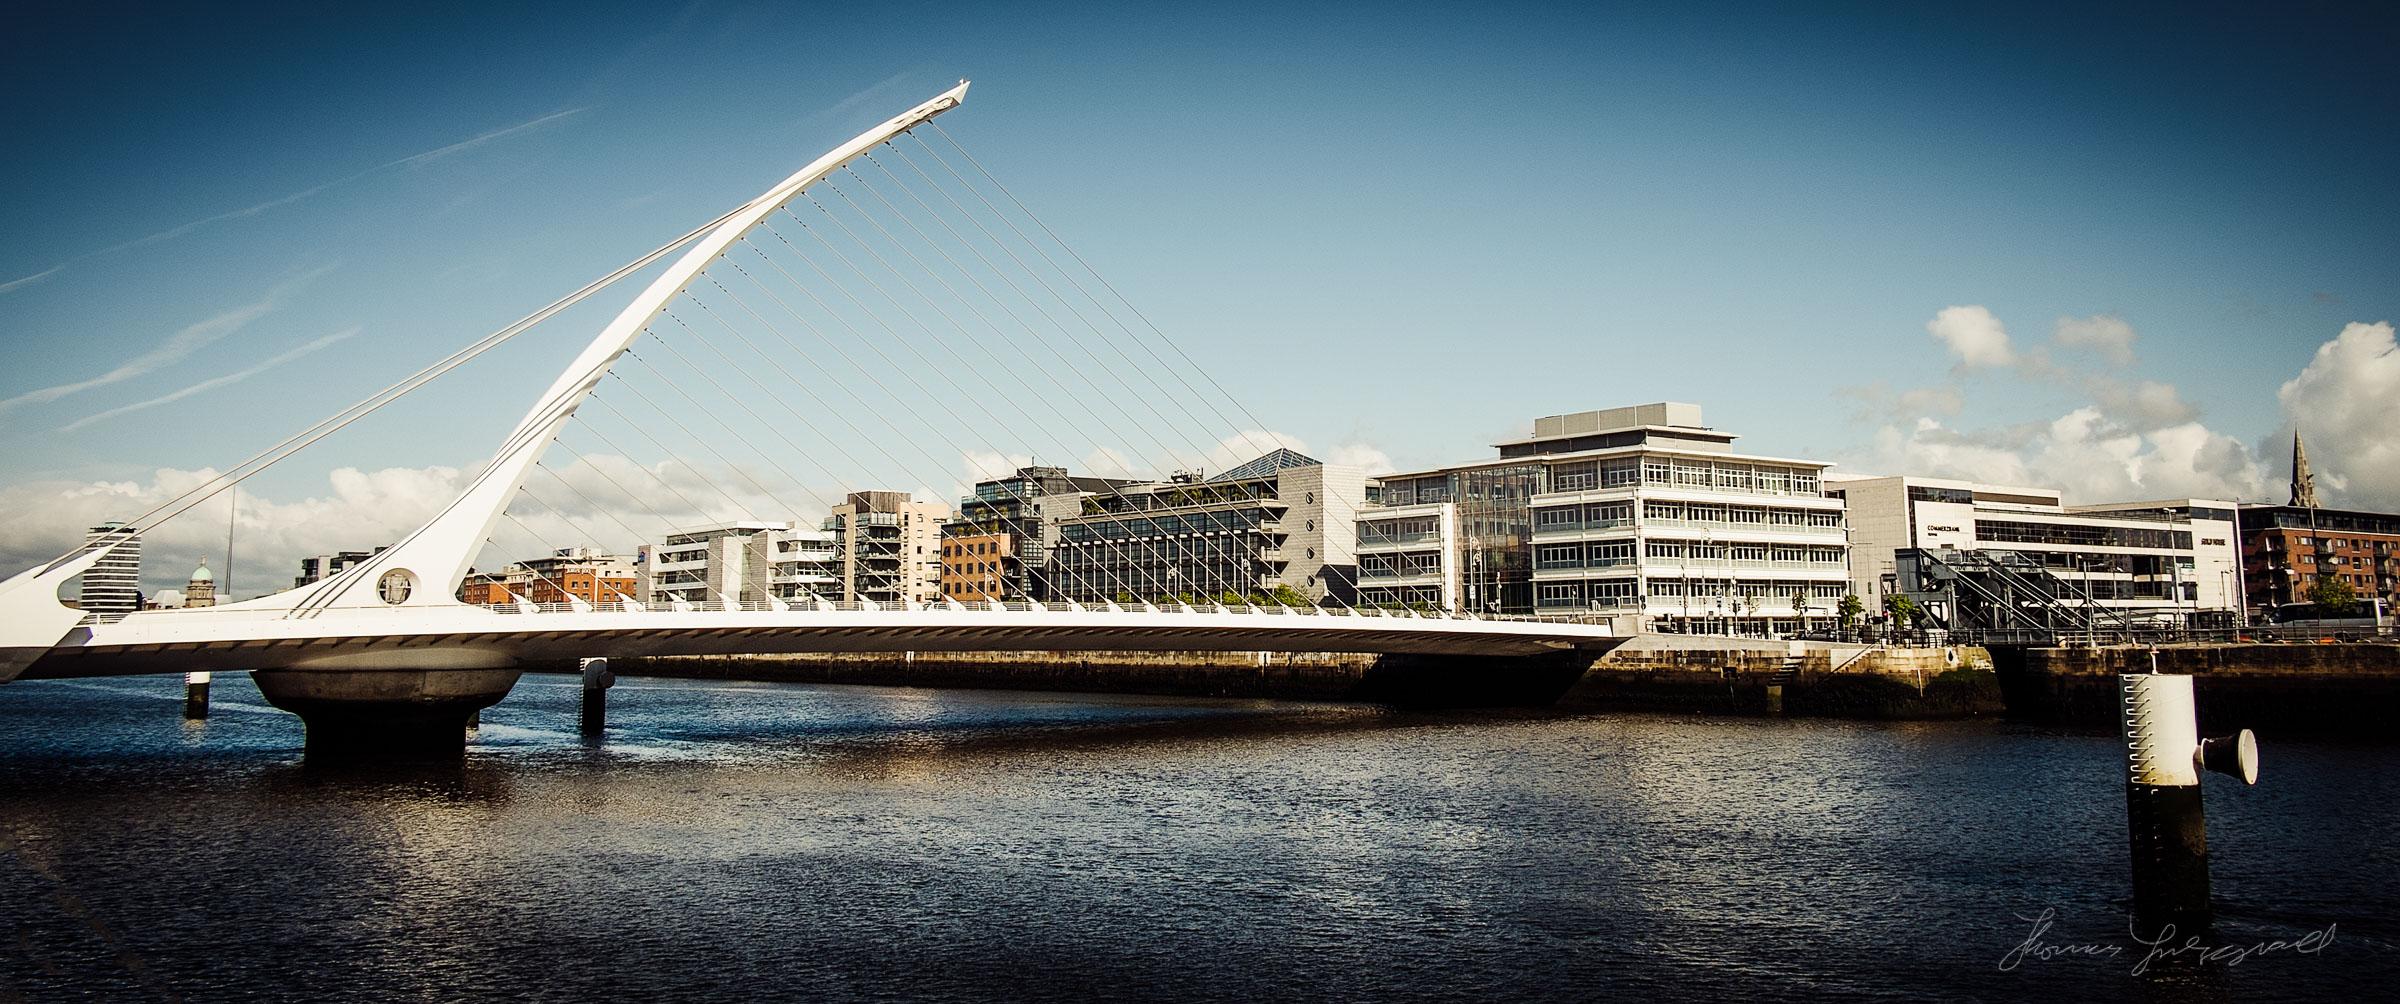 Streets-of-Dublin-Photo--34.jpg